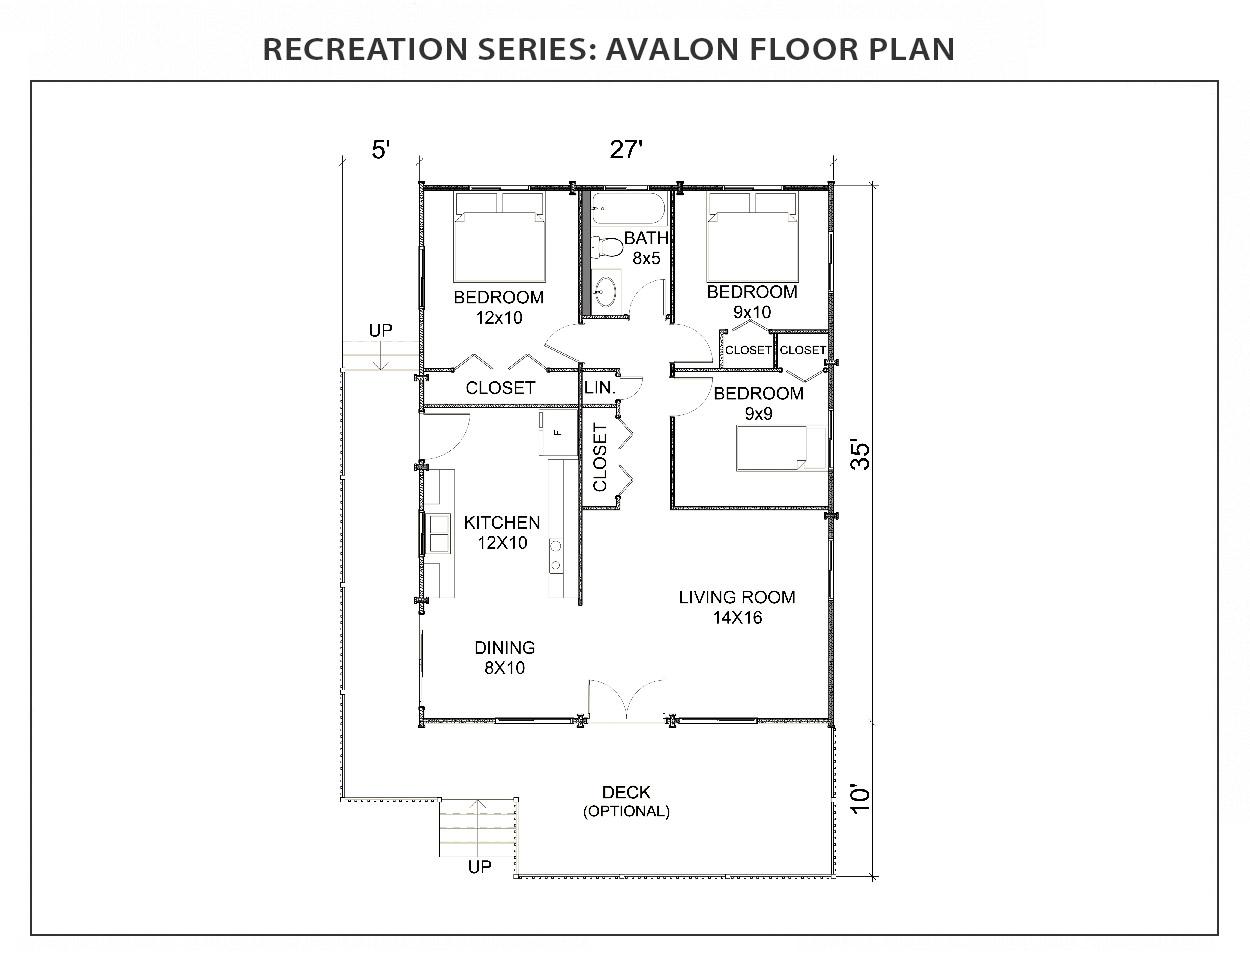 Avalon Floor Plan Recreation Series Ihc